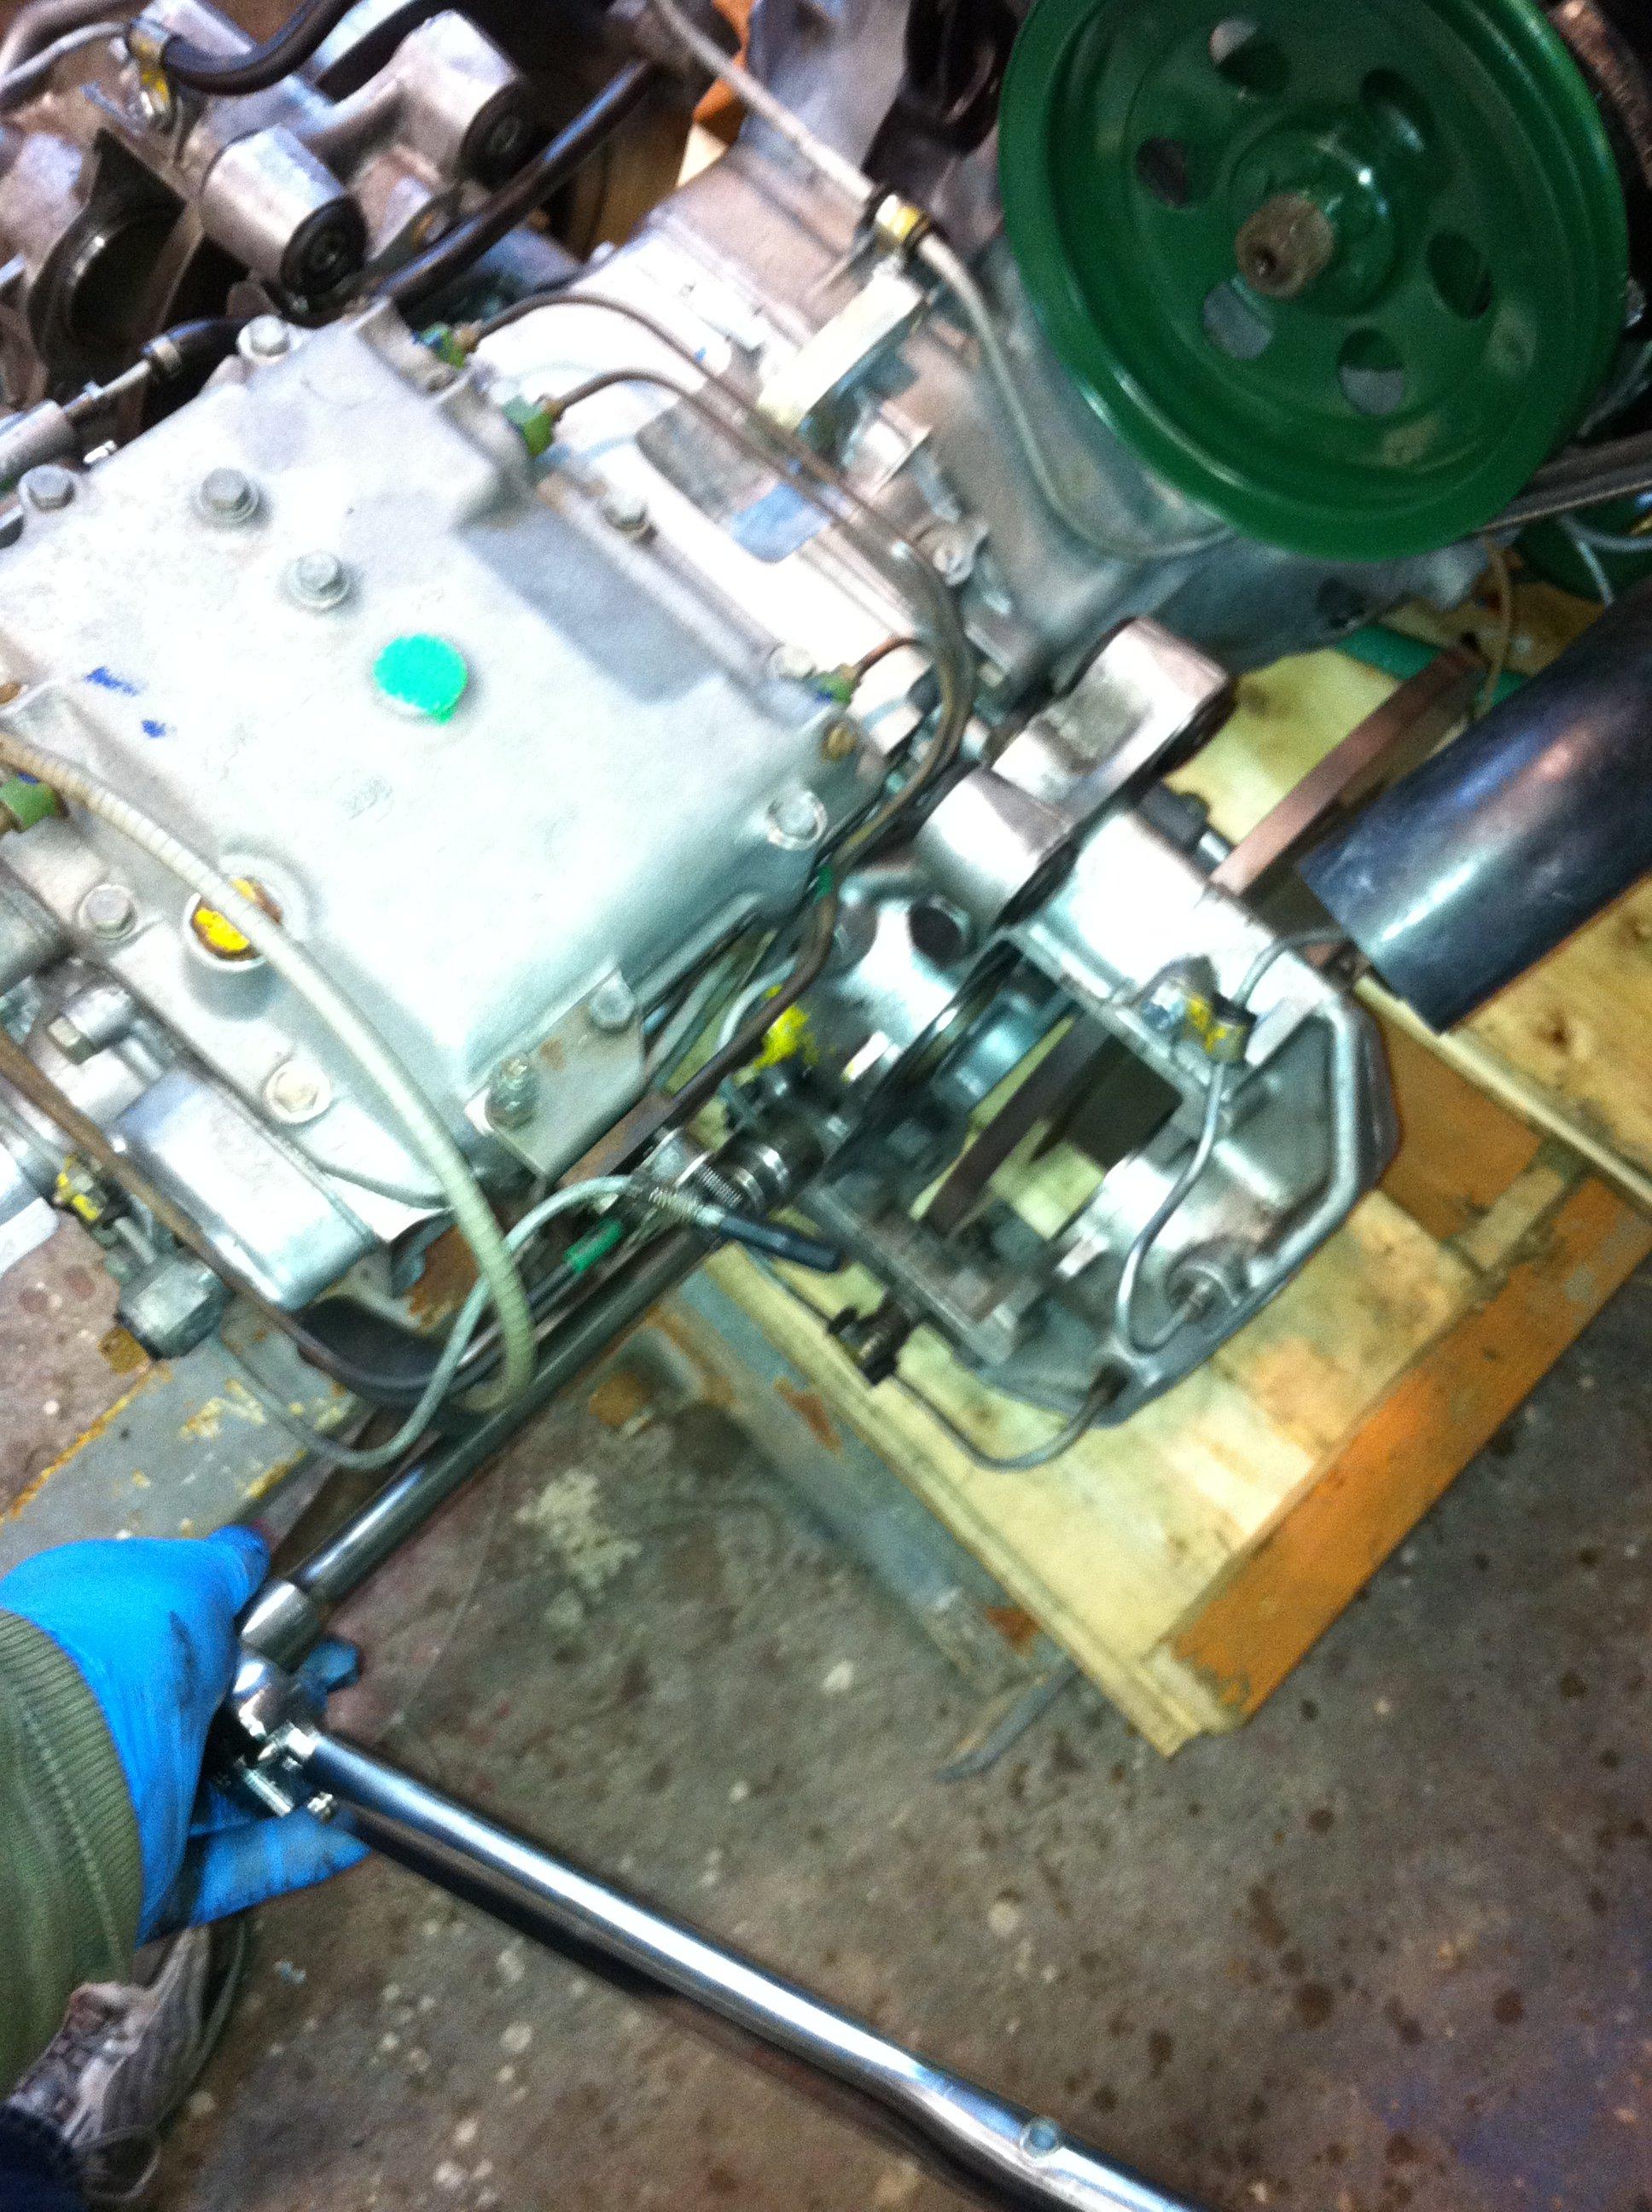 Torquing the brake attach bolts